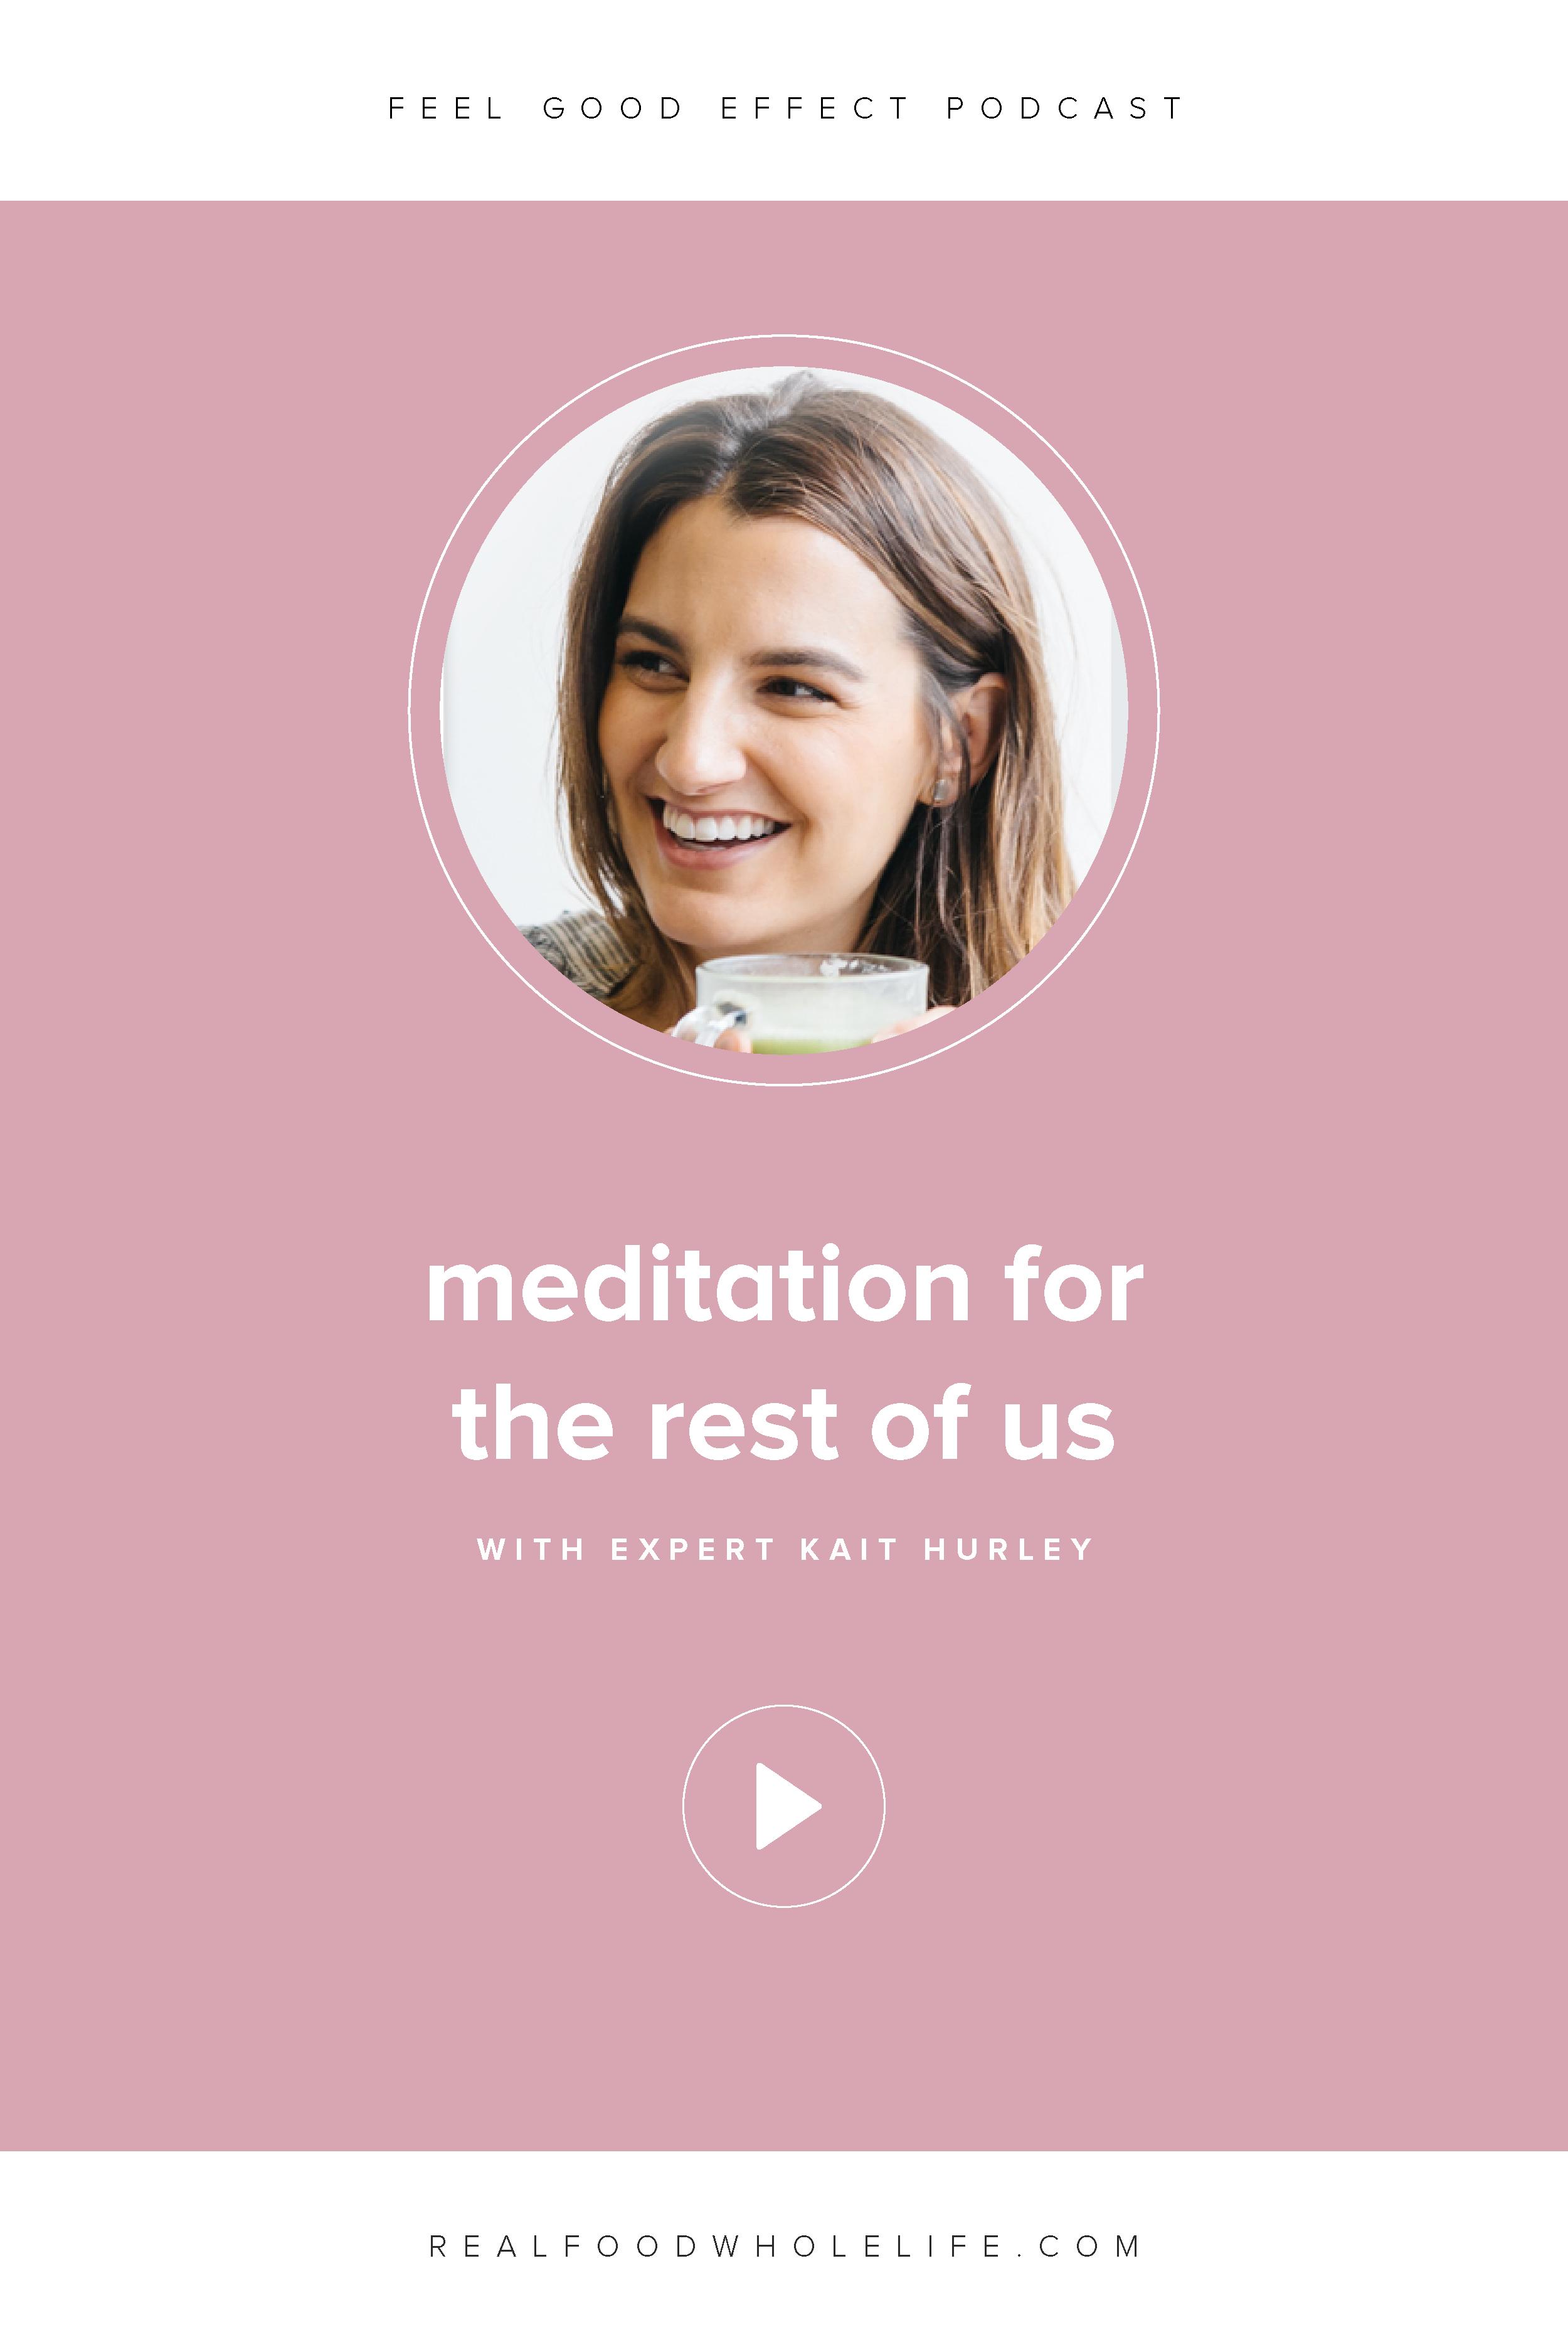 Kait Hurley on the Feel Good Effect Podcast